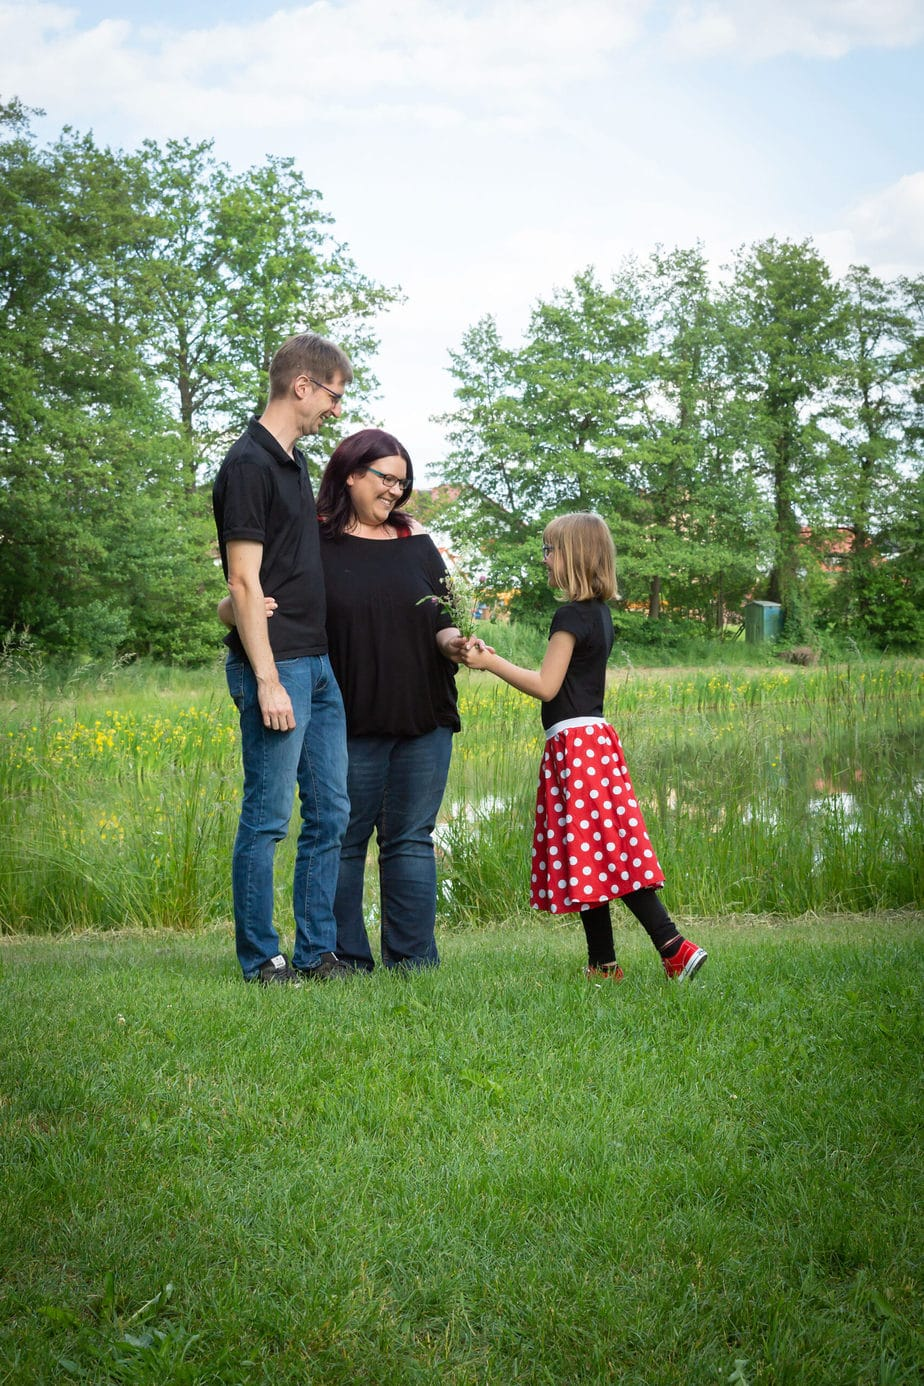 Spontanes Bild beim Familienshooting